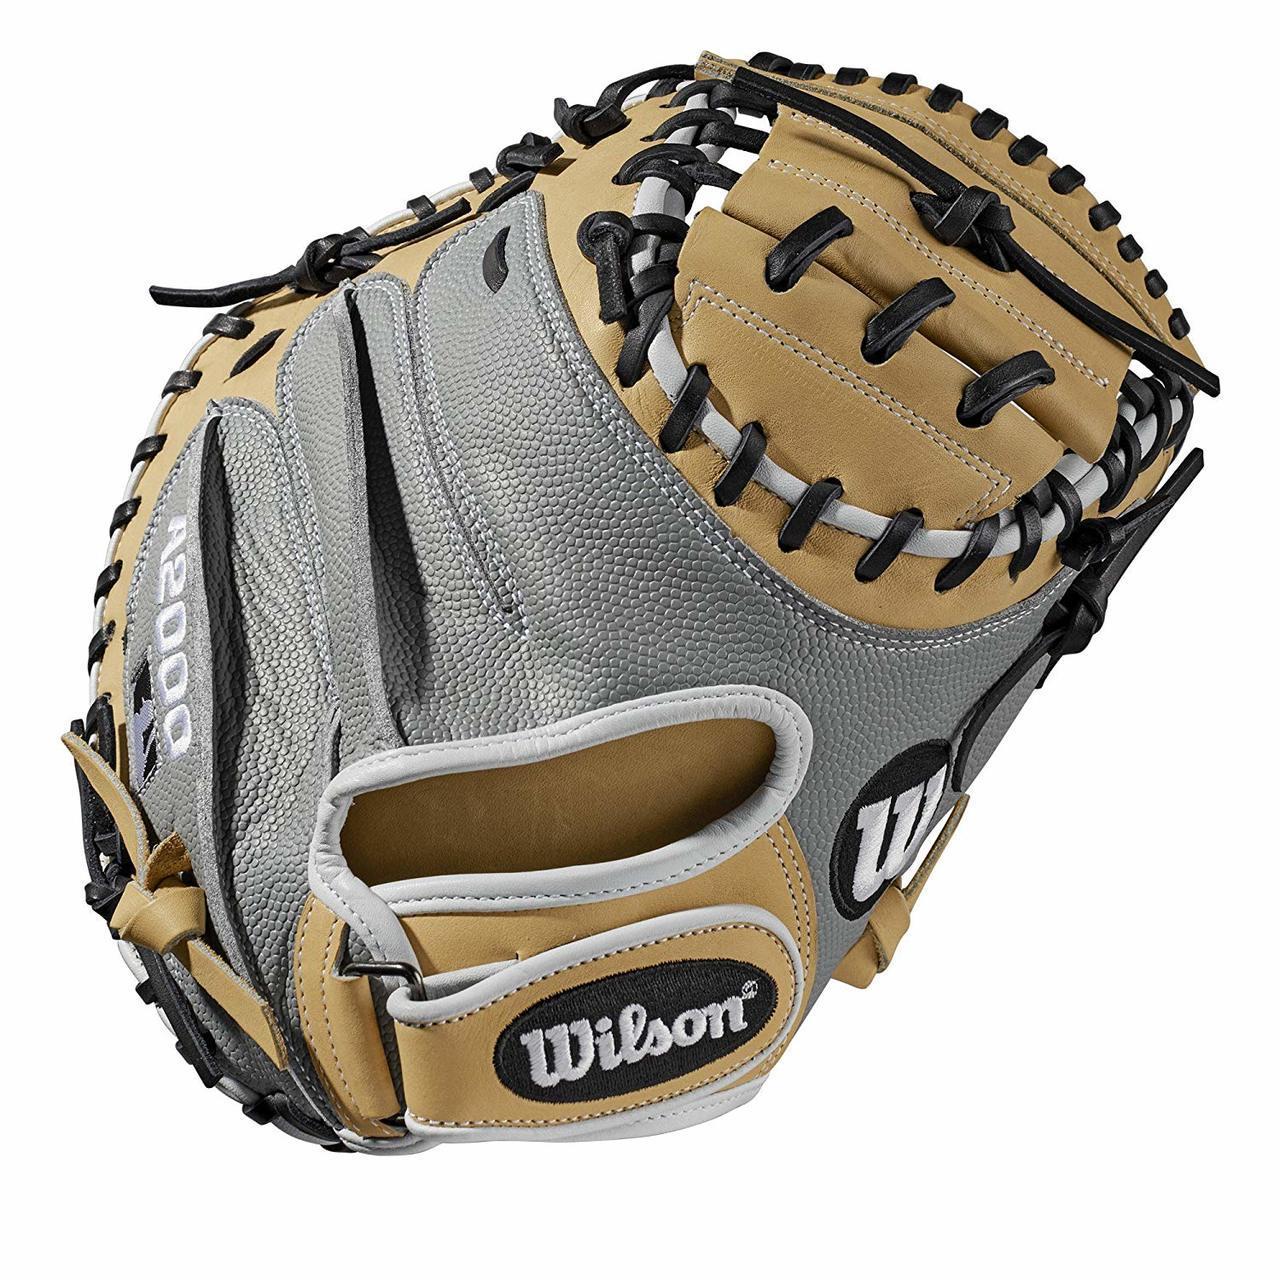 wilson catchers mitt wta20rb19pfcm33